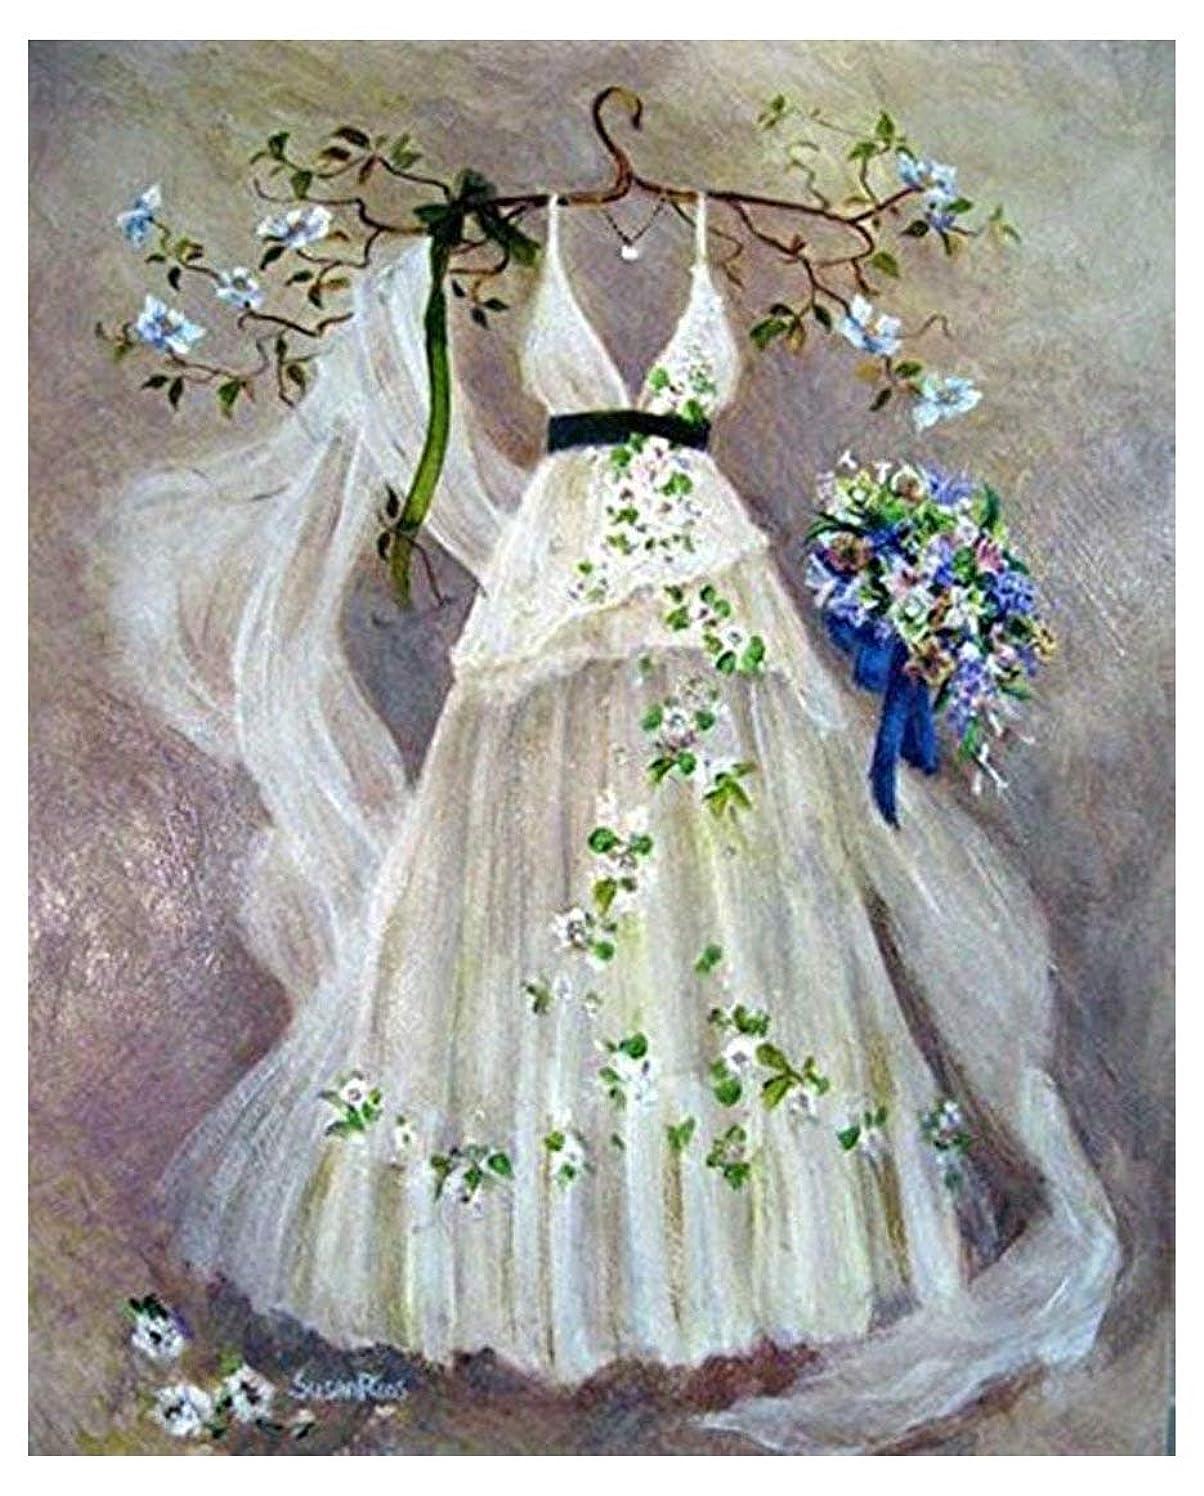 5D DIY Crystal Diamond Rhinestone Painting By Number Cross Stitch Embroidery DIY Craft Romantic Wedding (30x40) CM